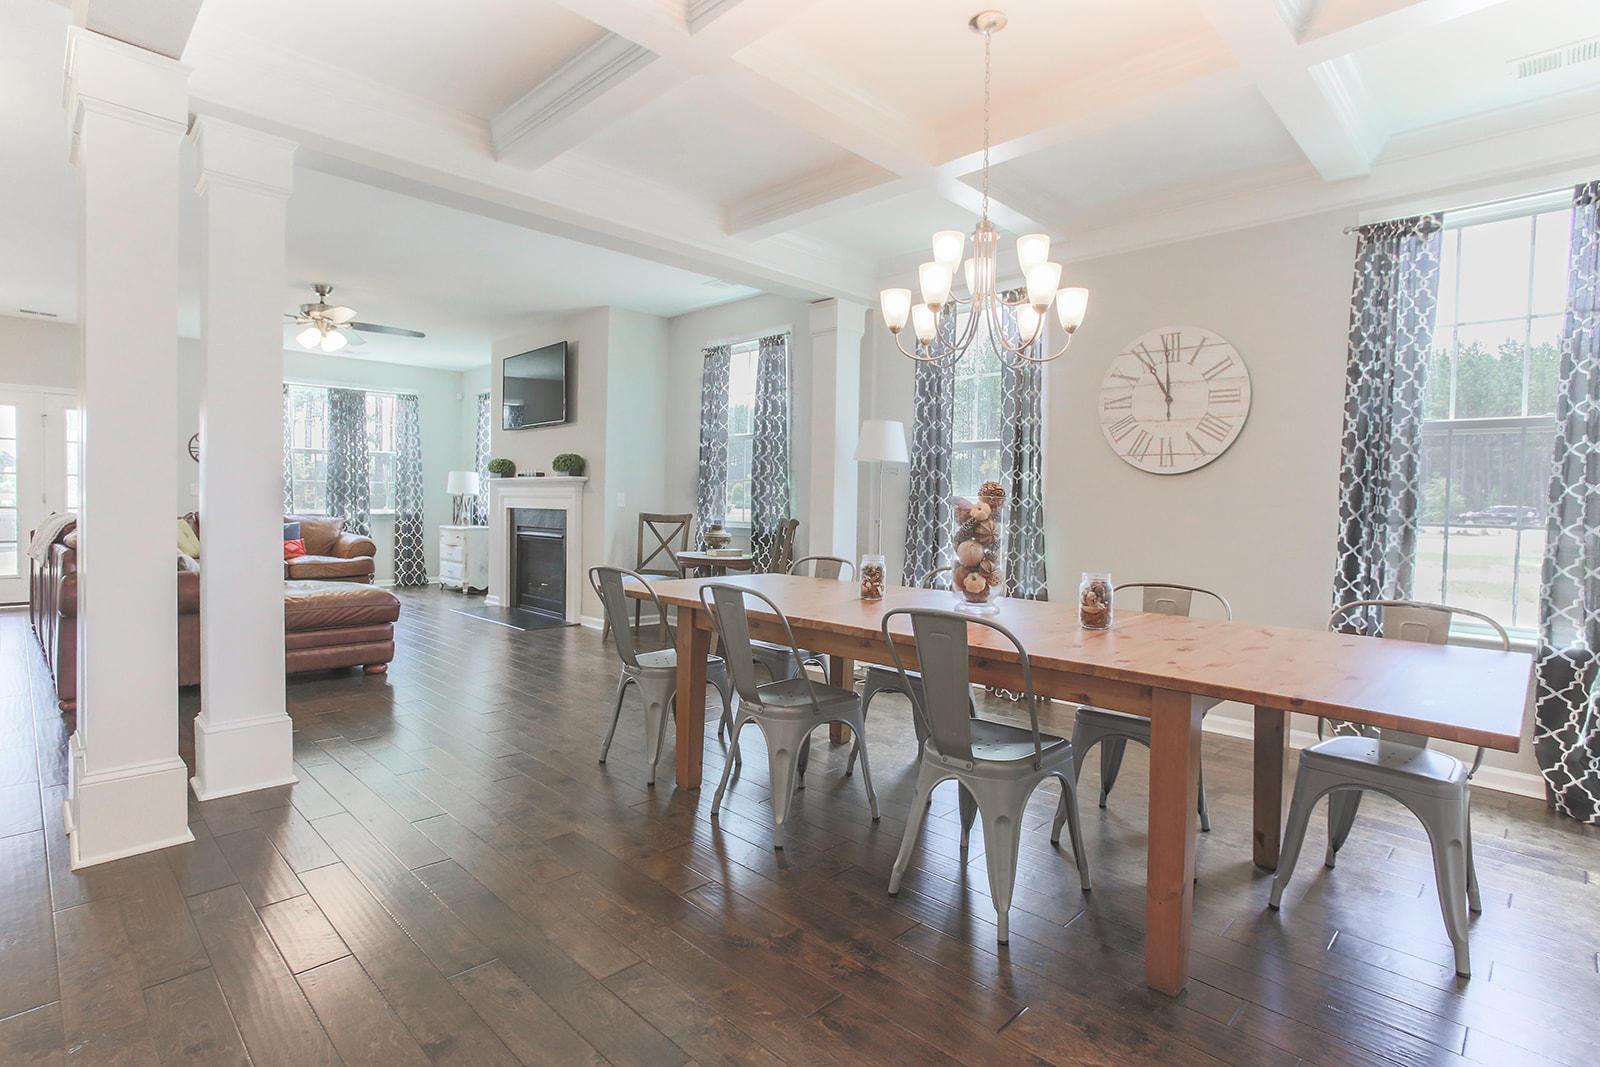 Cane Bay Plantation Homes For Sale - 355 Saxony, Summerville, SC - 3